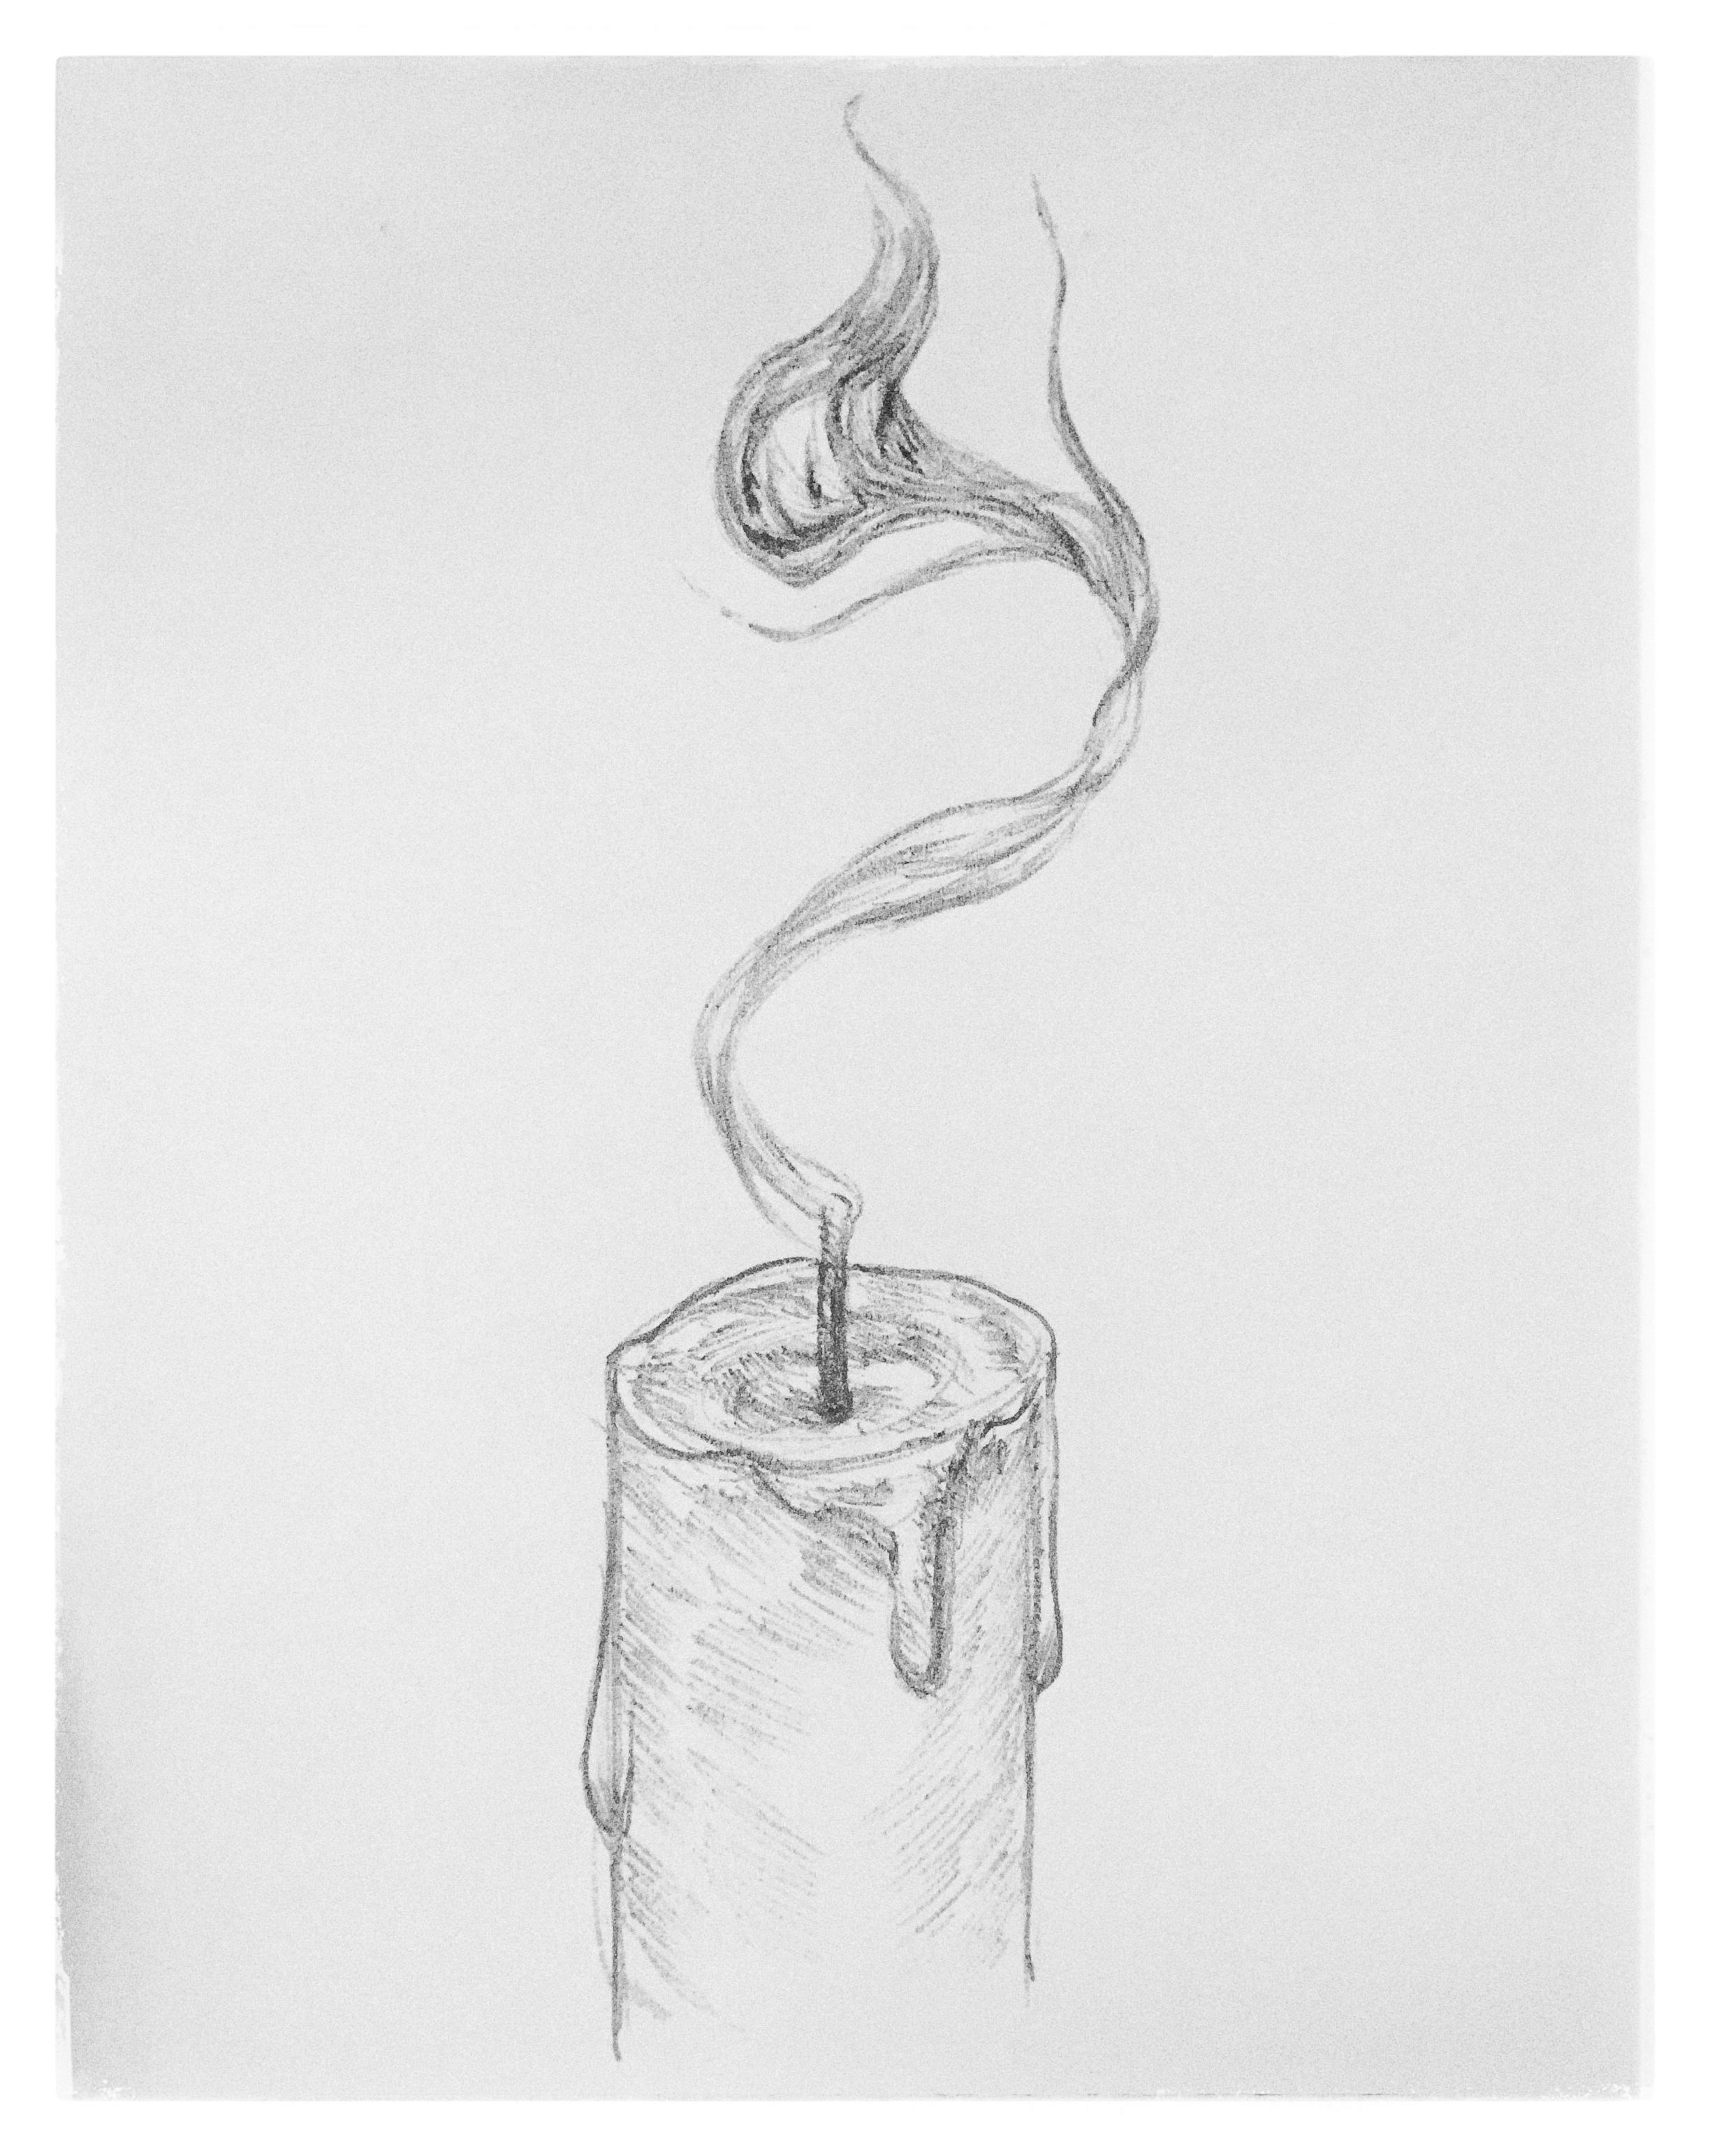 Drawn spirit smokey #pencil 8 #candle #character